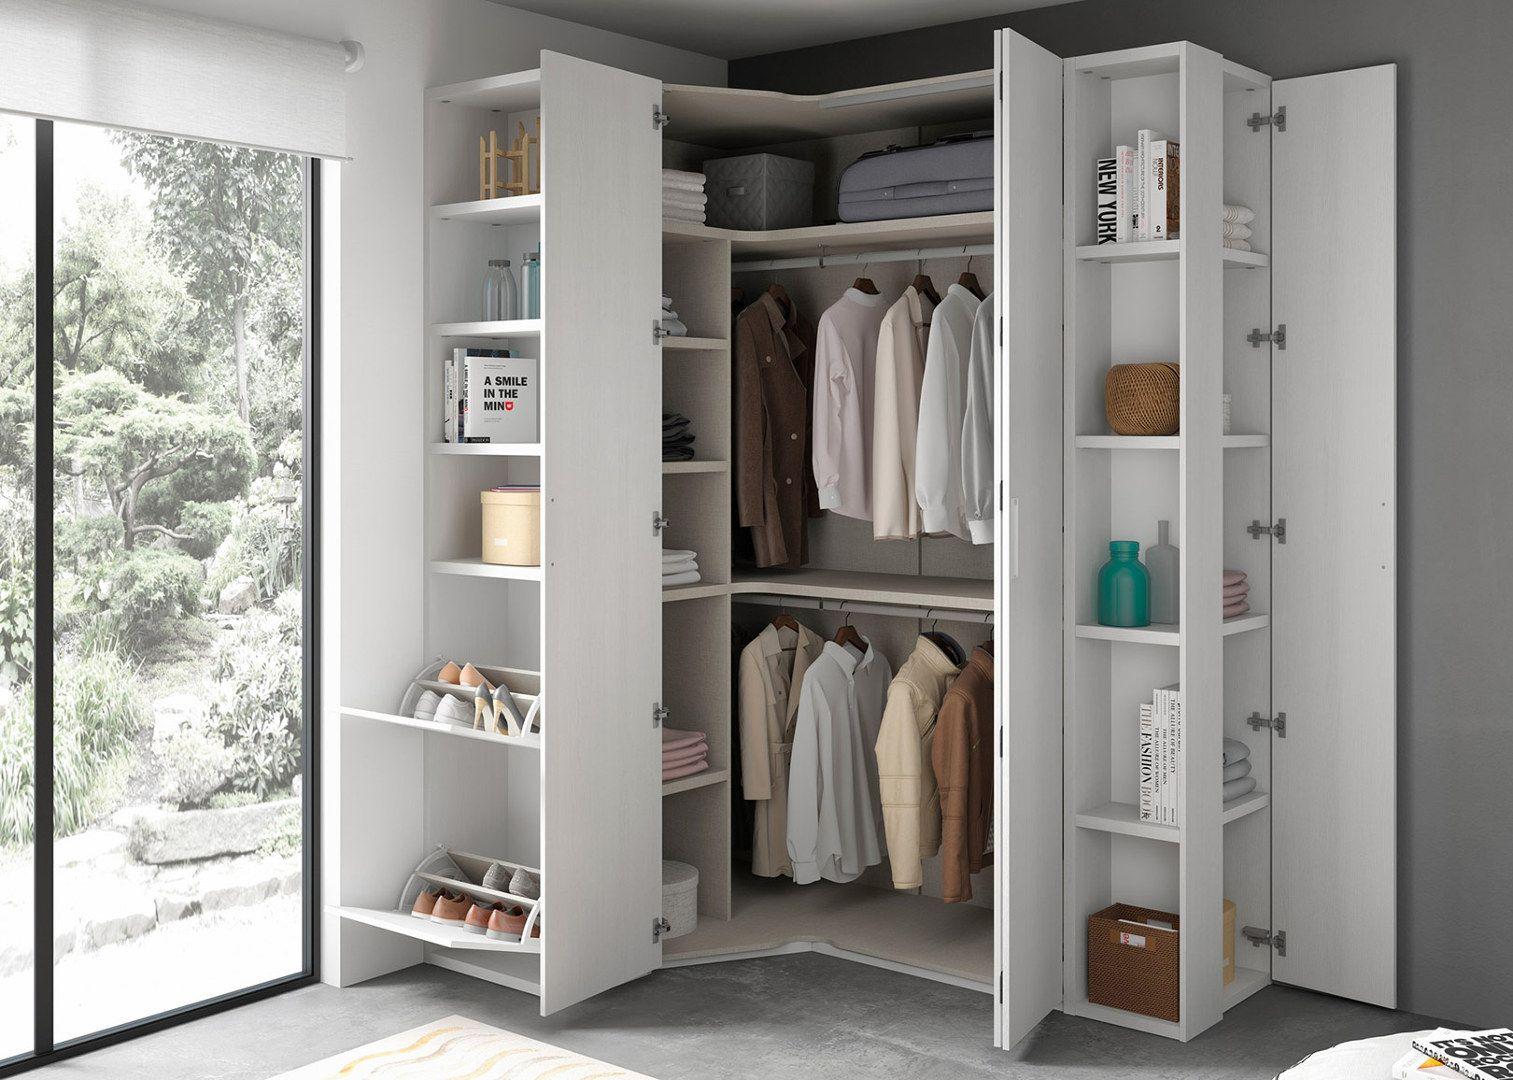 armario grandes dimensiones decoraci n en 2019 pinterest schrank kleiderschrank y. Black Bedroom Furniture Sets. Home Design Ideas